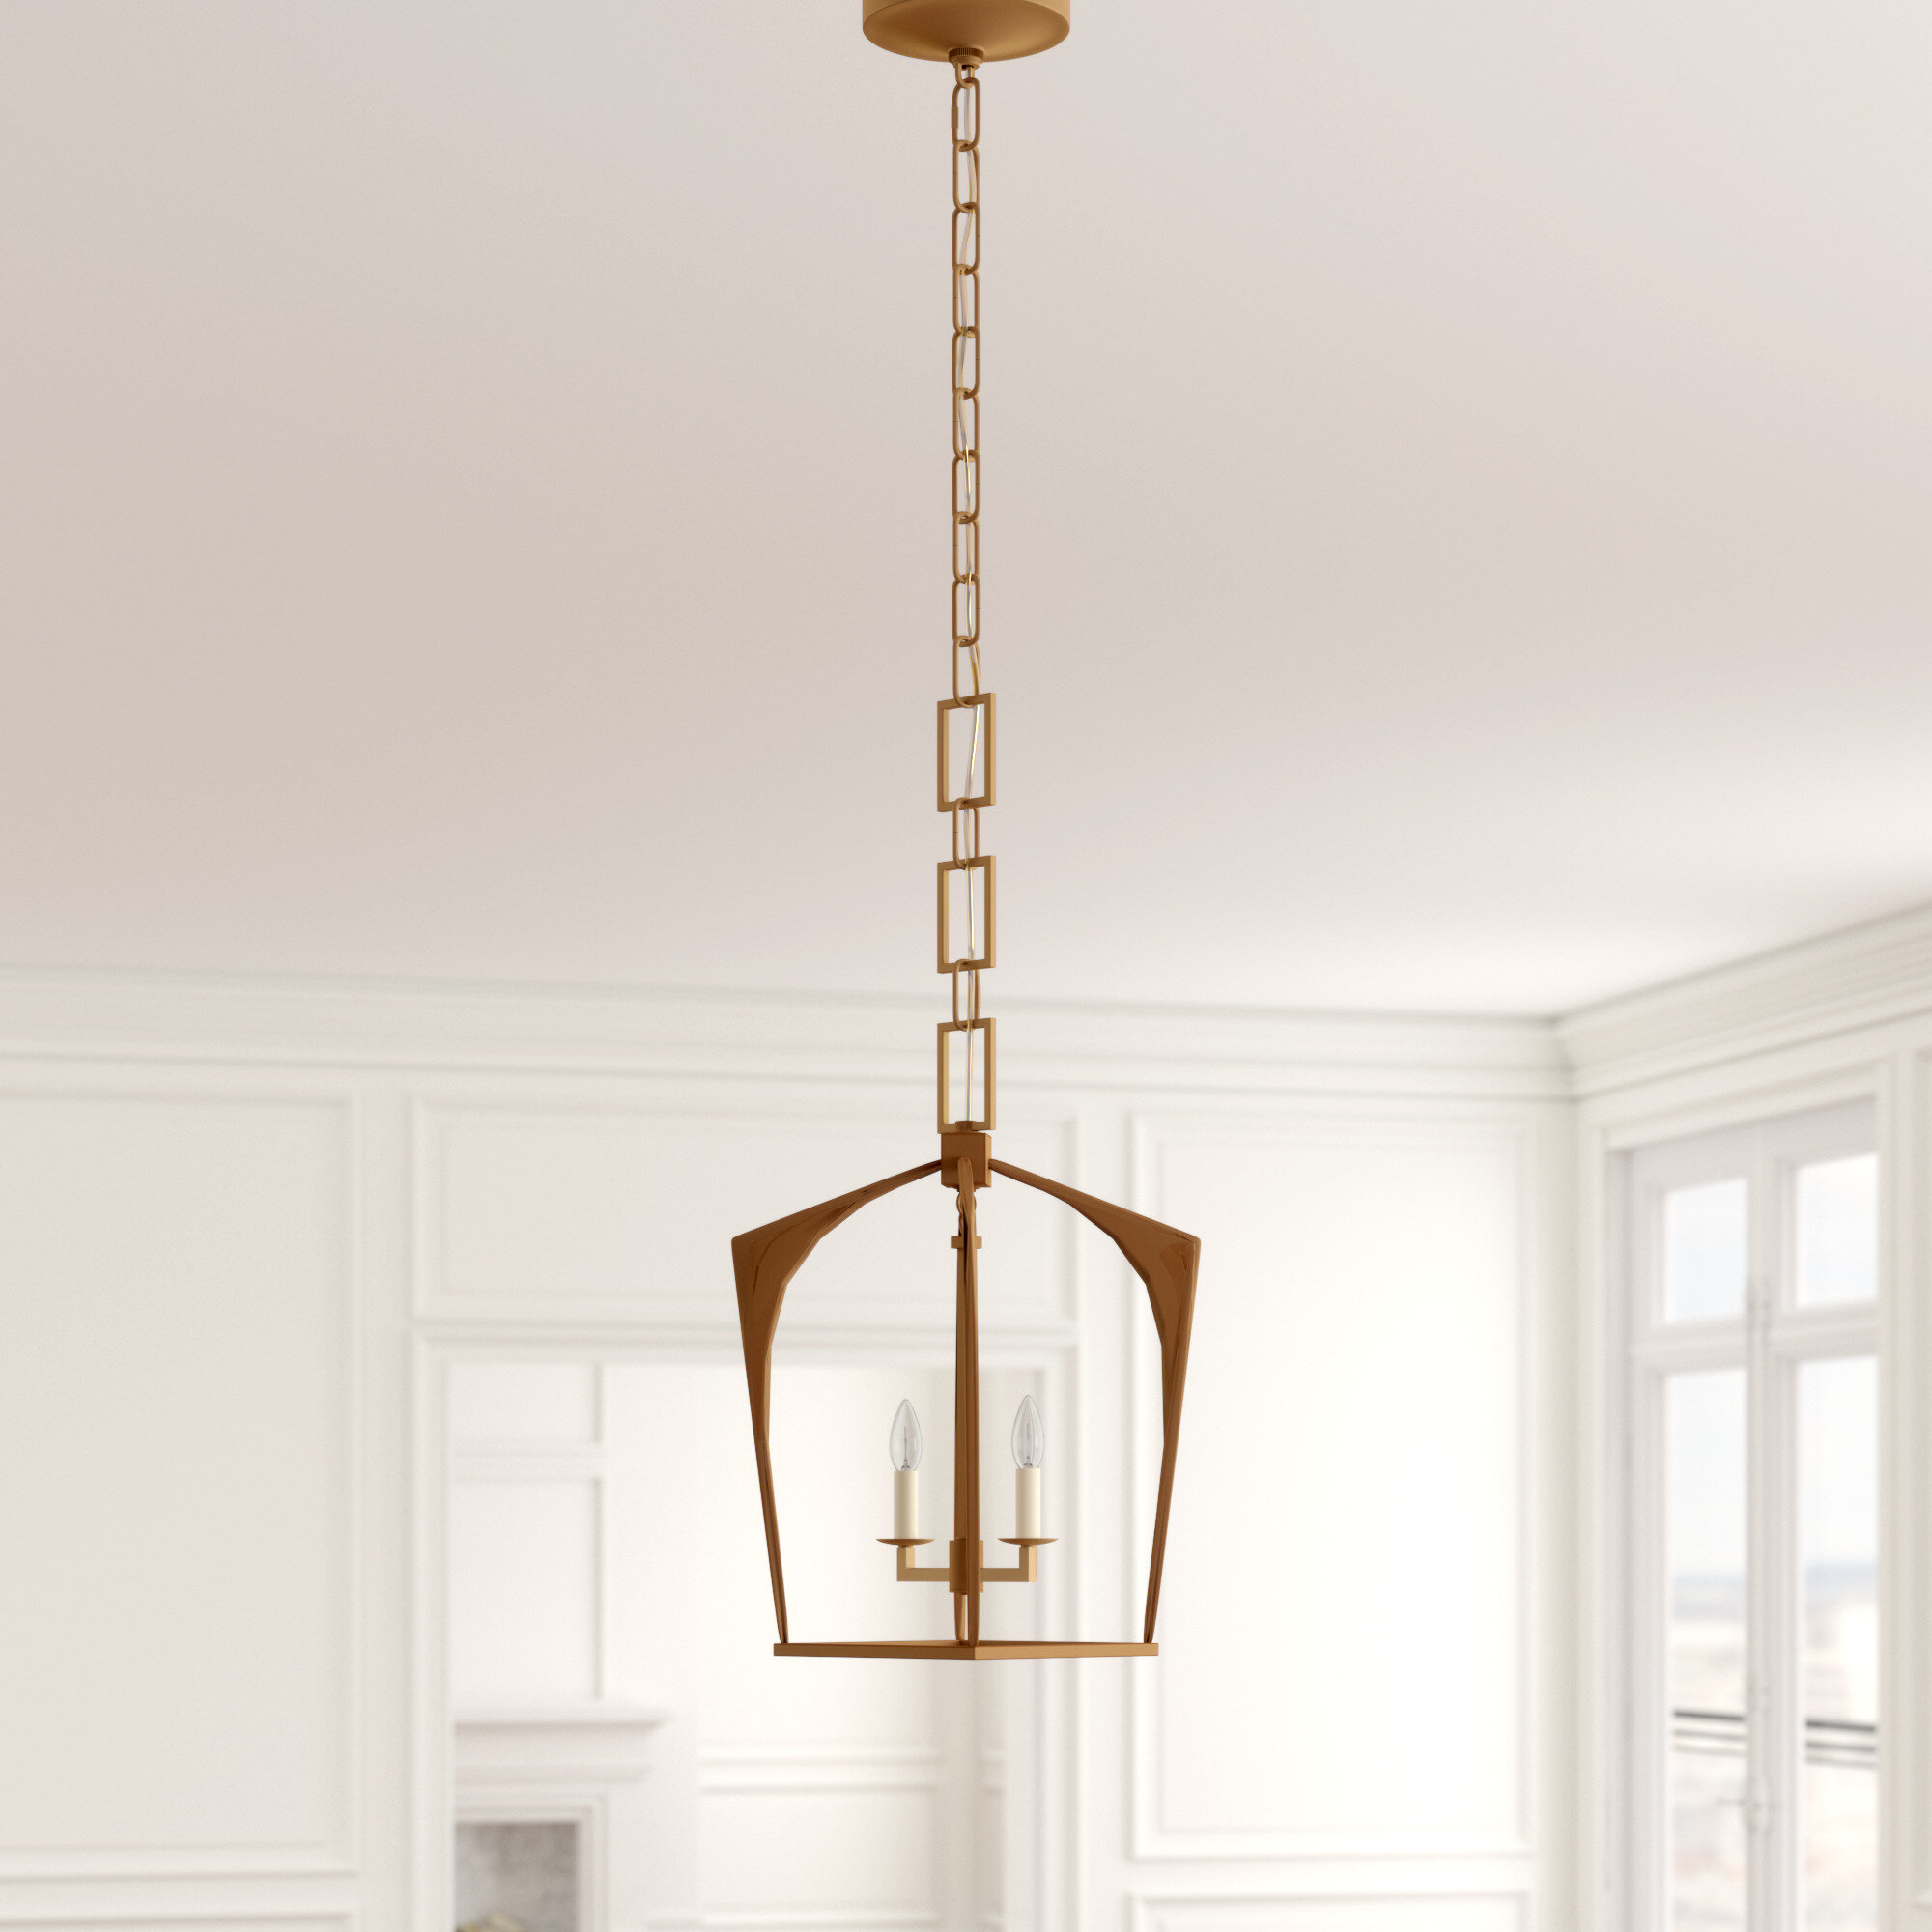 Everly Pendant | Wayfair throughout Adcock 3-Light Single Globe Pendants (Image 16 of 30)